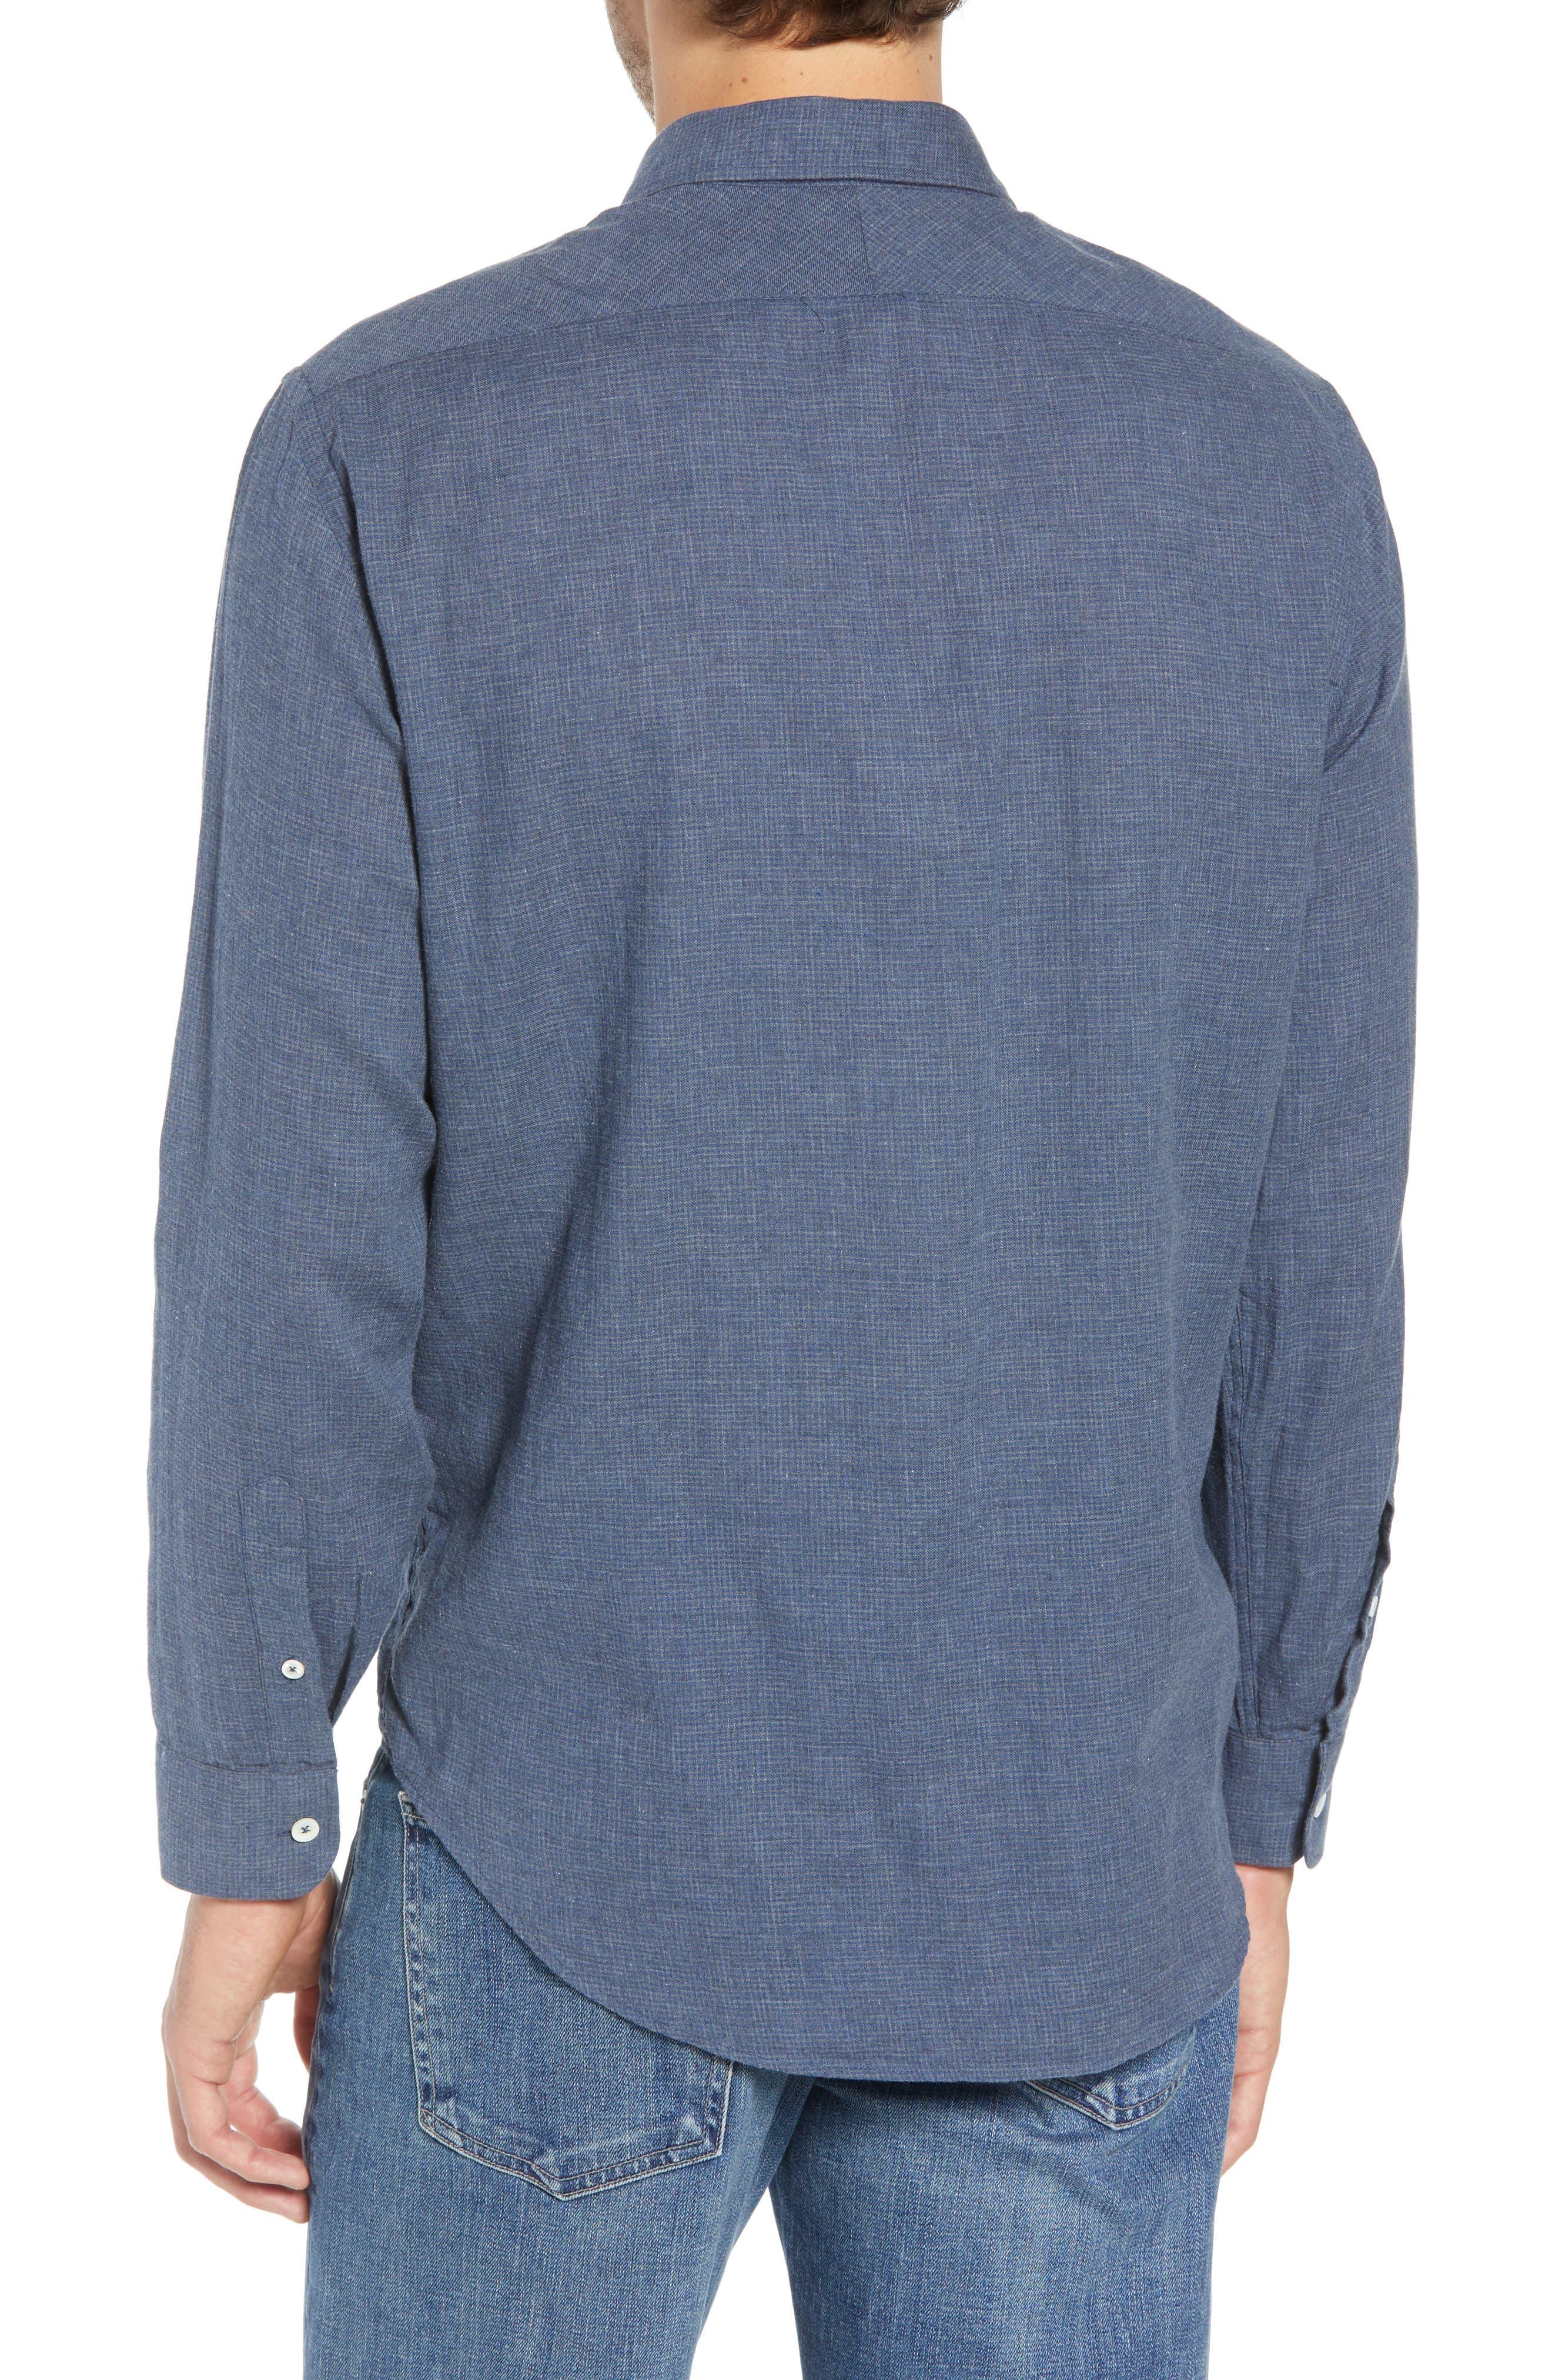 John Regular Fit Sport Shirt,                             Alternate thumbnail 2, color,                             420